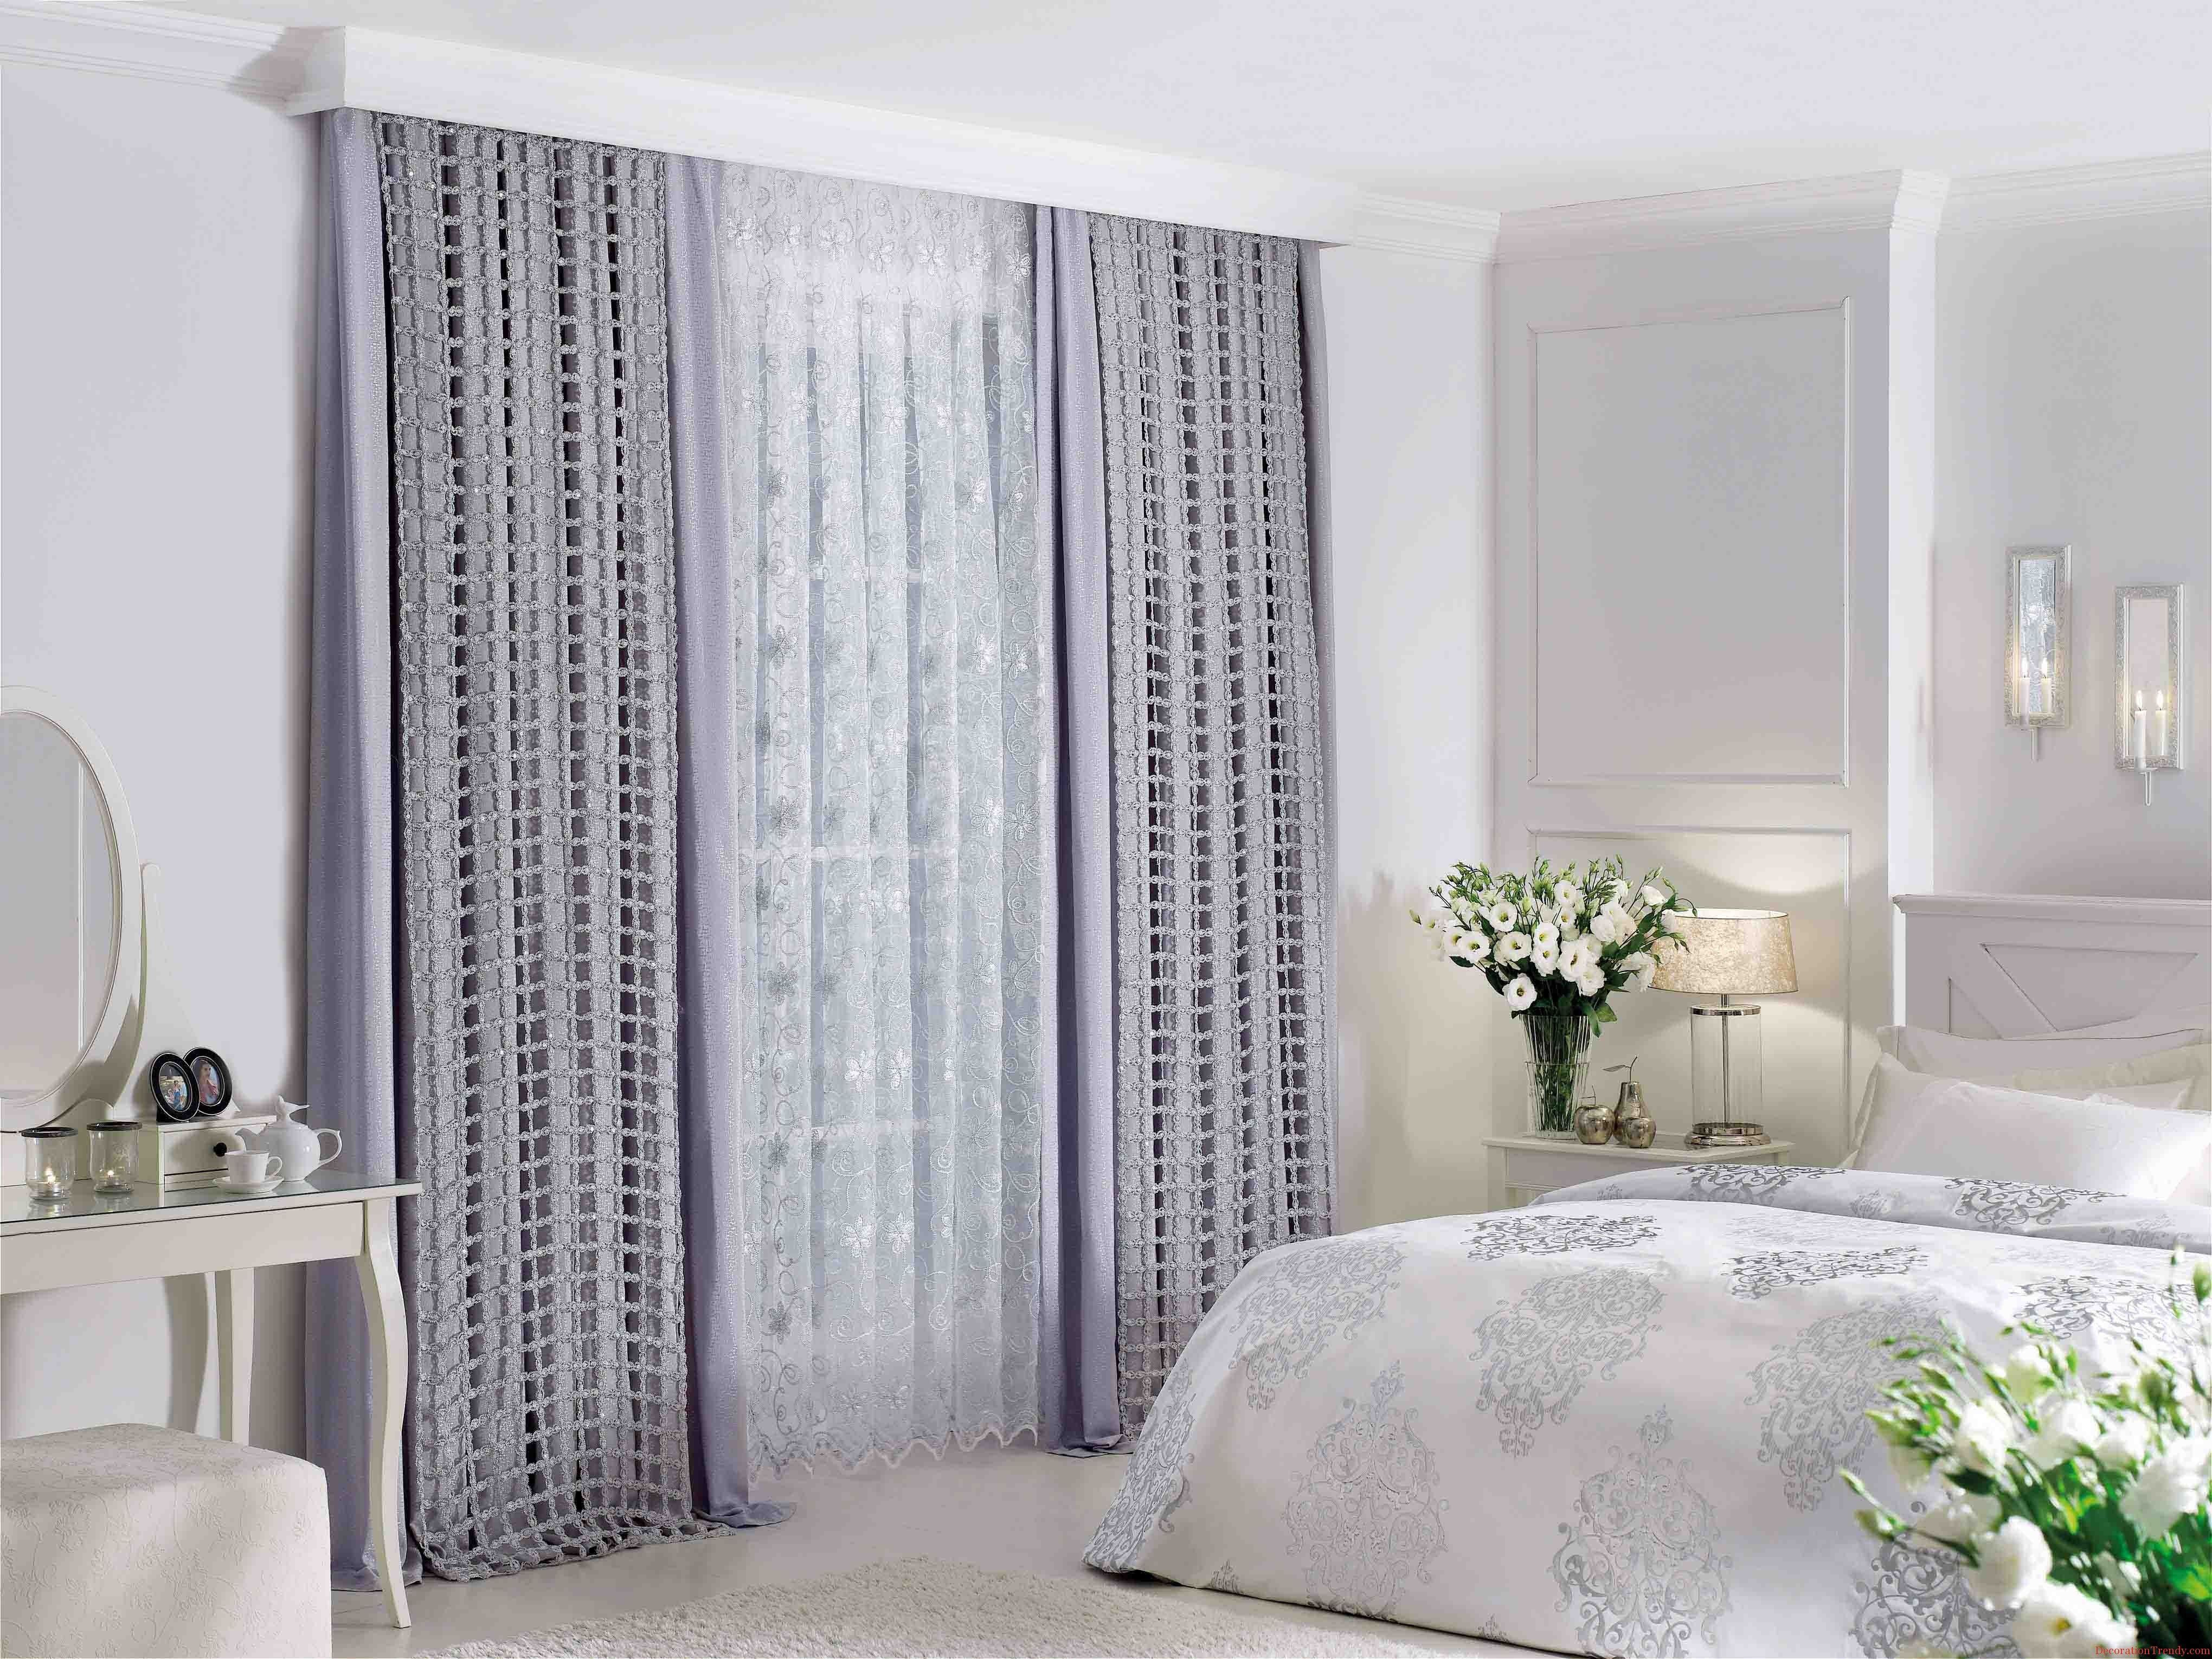 Best Curtain Models Design Decoration Best Curtain Models And - Contemporary curtain designs